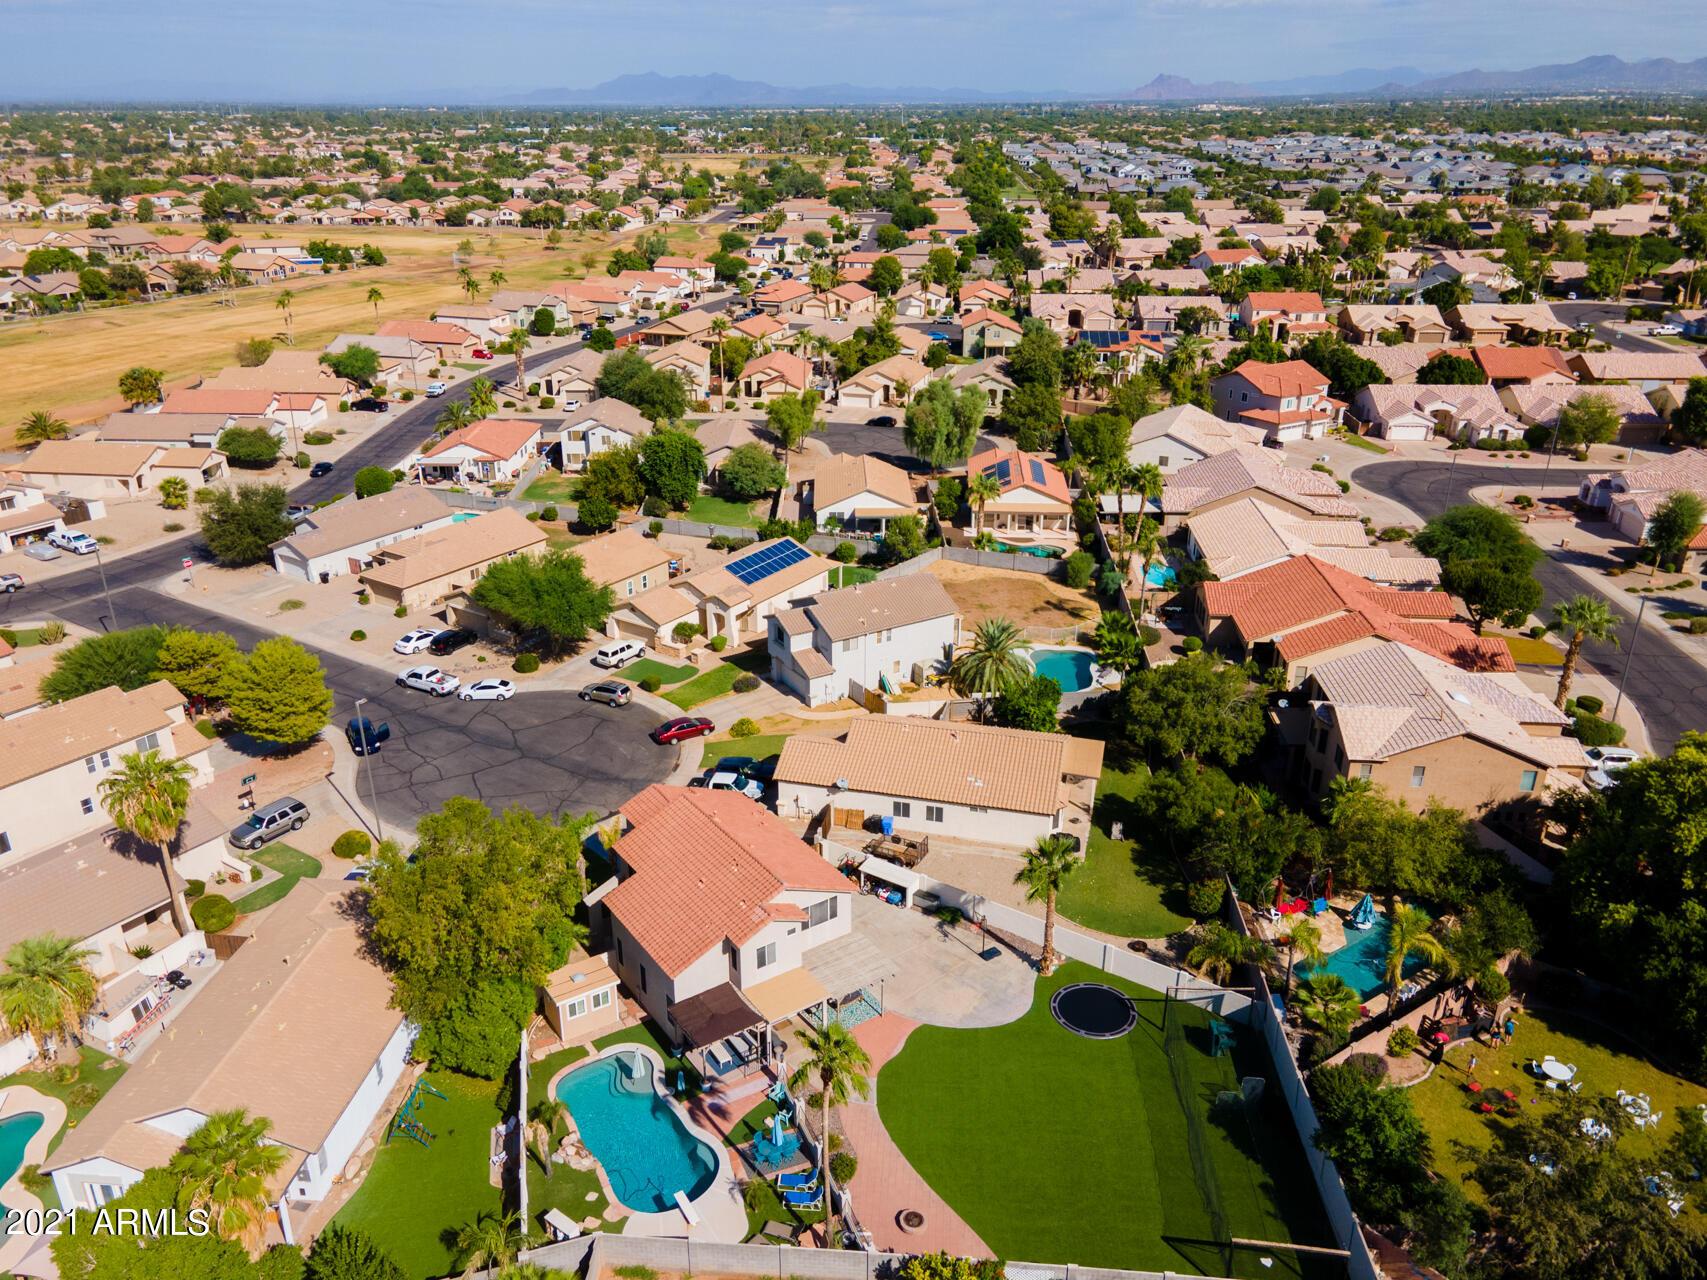 MLS 6307416 2795 E GILA Court, Gilbert, AZ 85296 Cul-De-Sac Homes